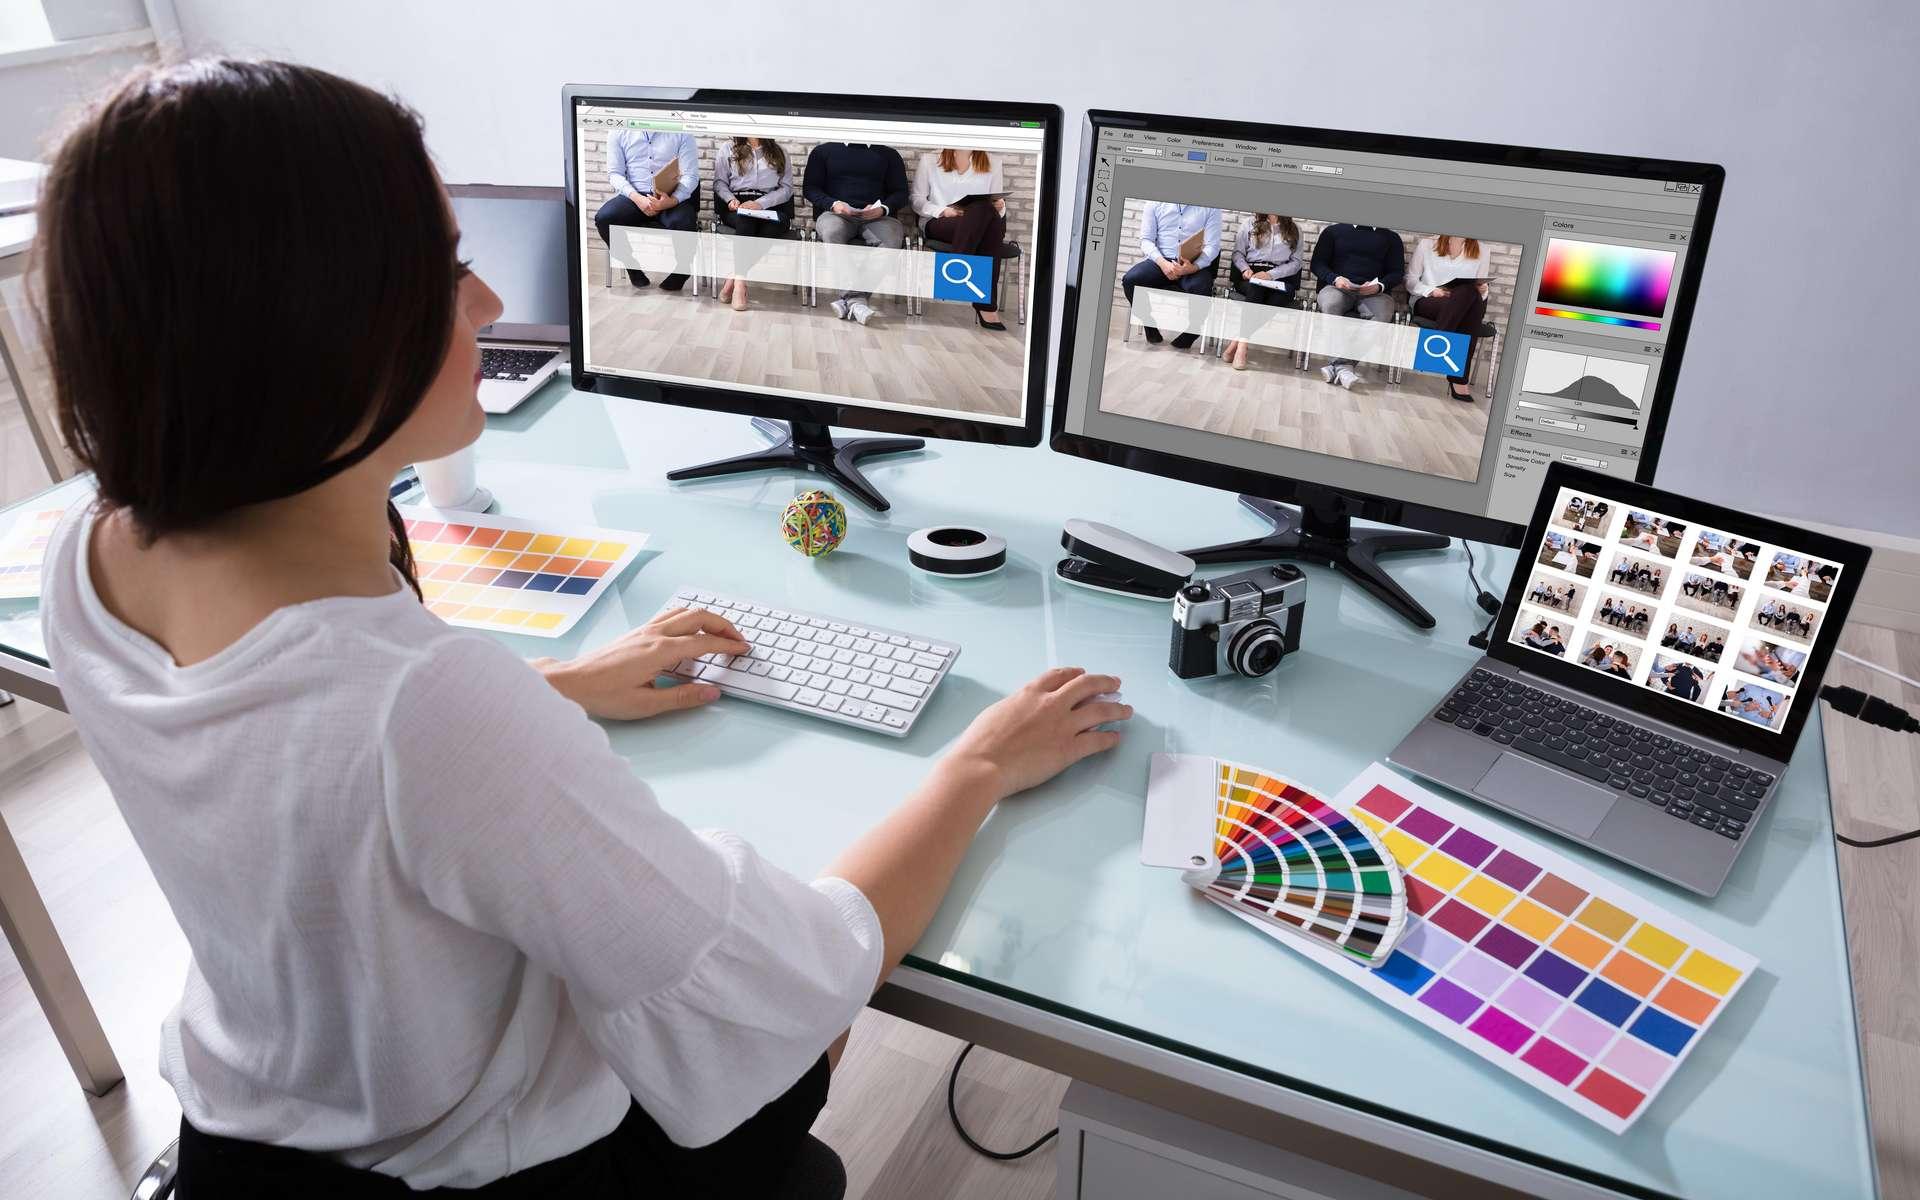 Formation Udemy : devenir Web Designer © Andrey Popov, Adobe Stock